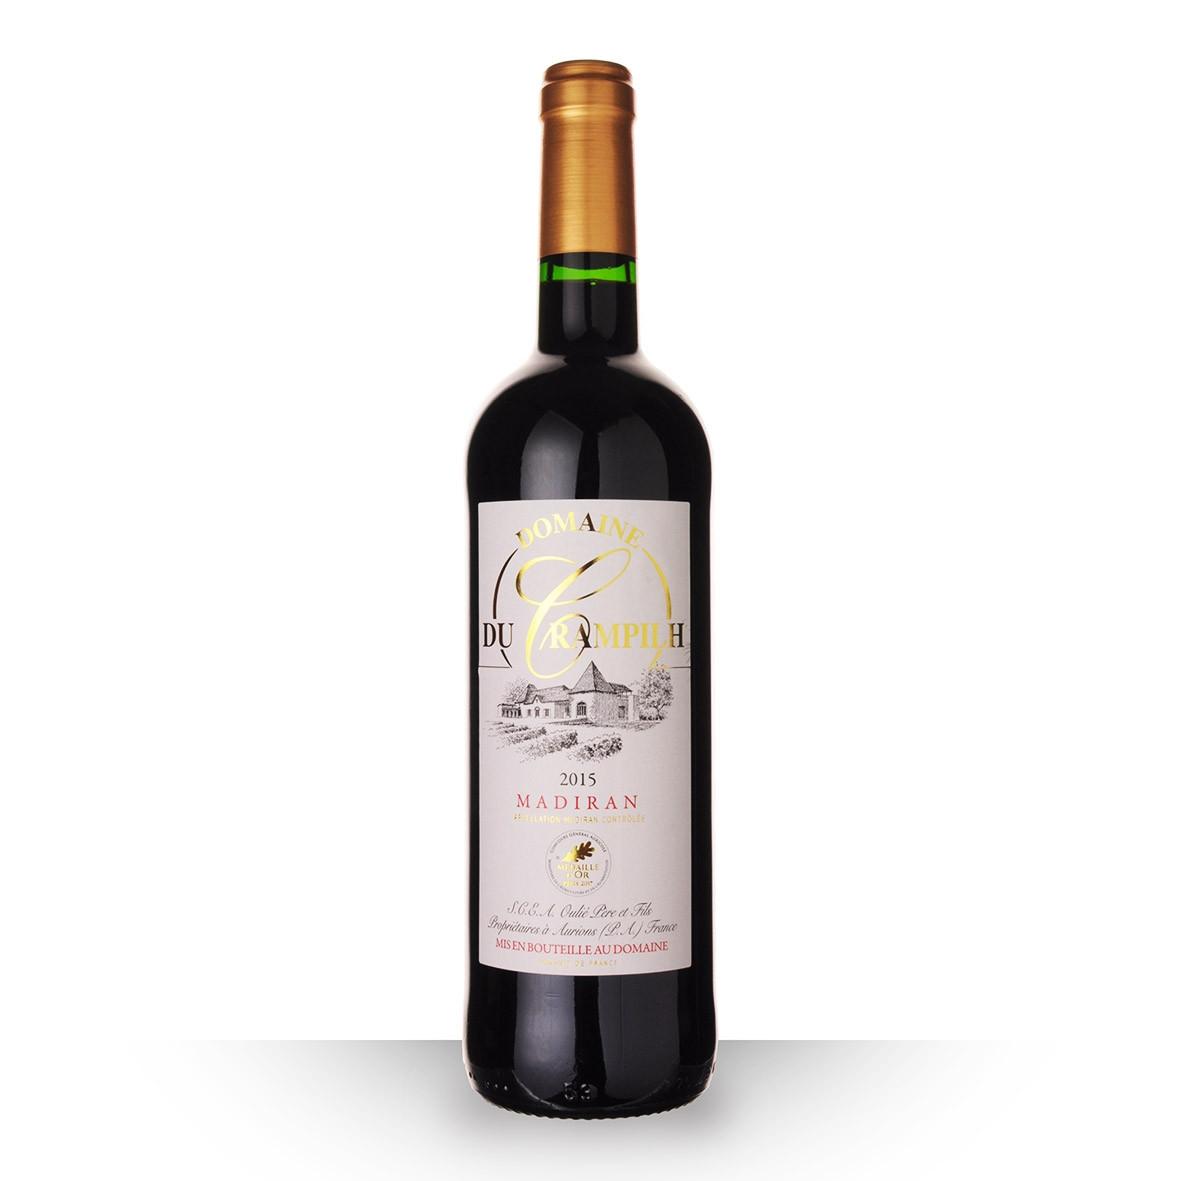 Domaine du Crampilh Madiran Rouge 2015 75cl www.odyssee-vins.com